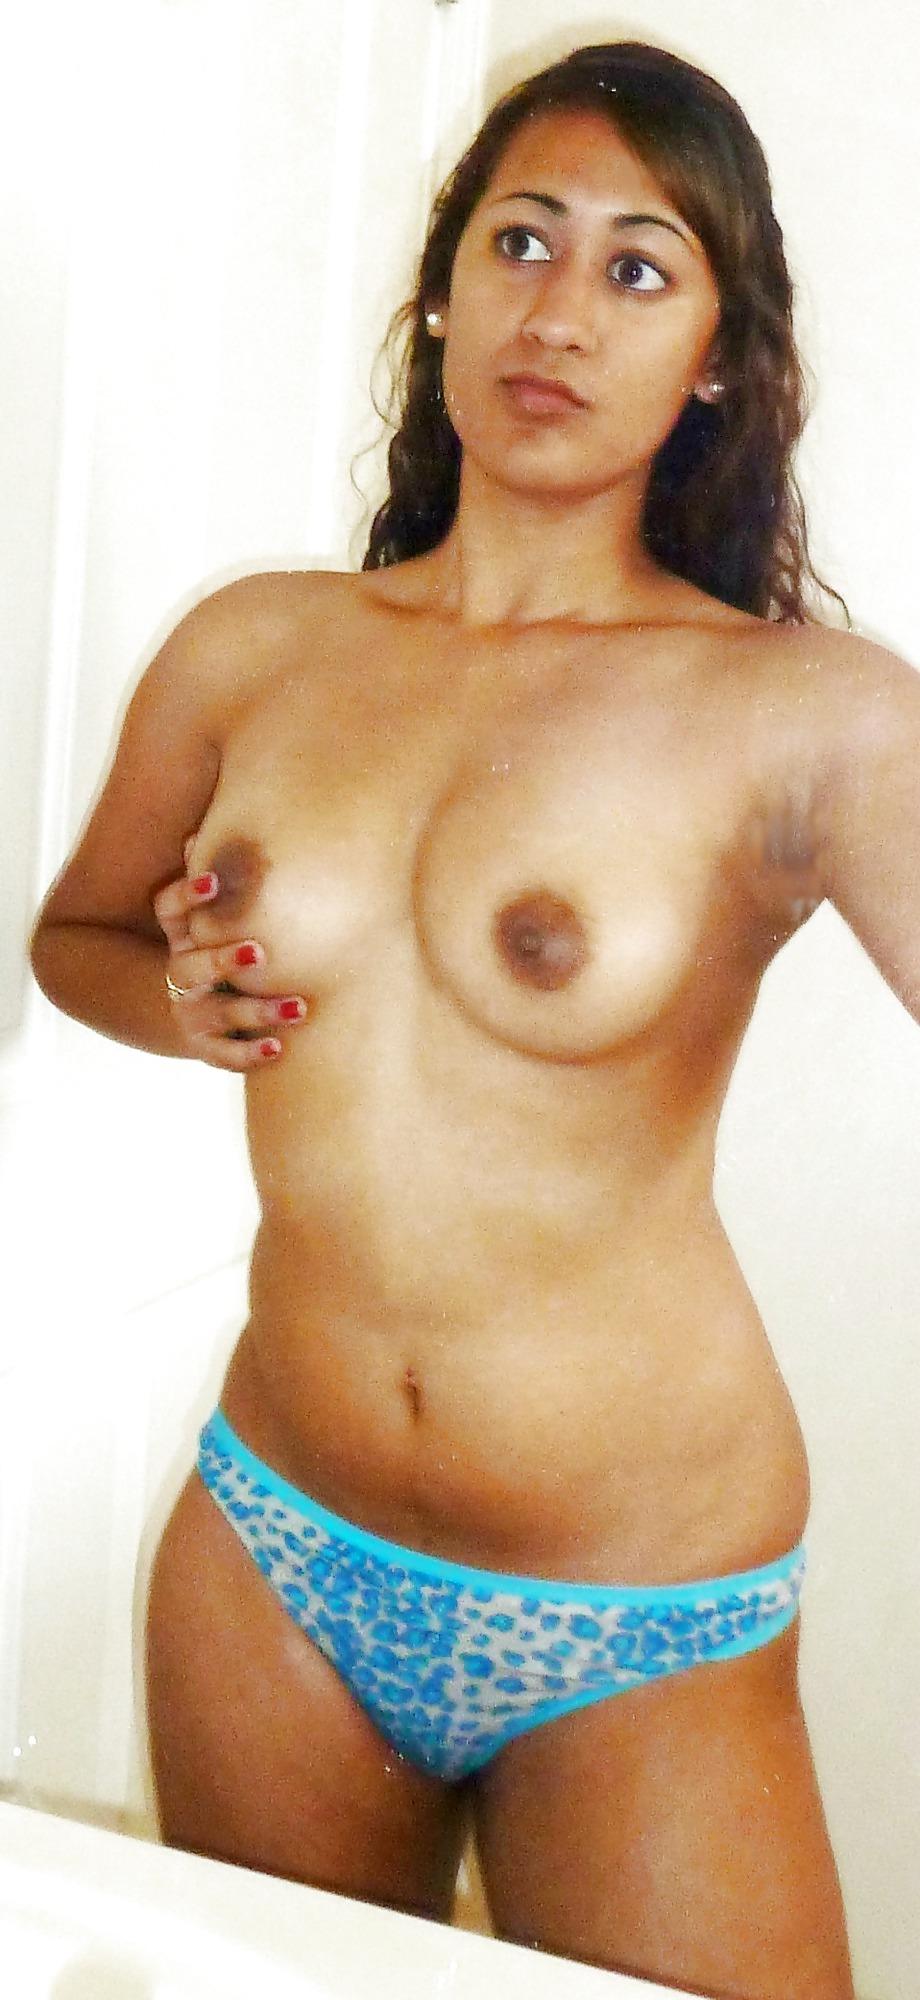 Half caste indian girls naked, pussy pop like a stripper